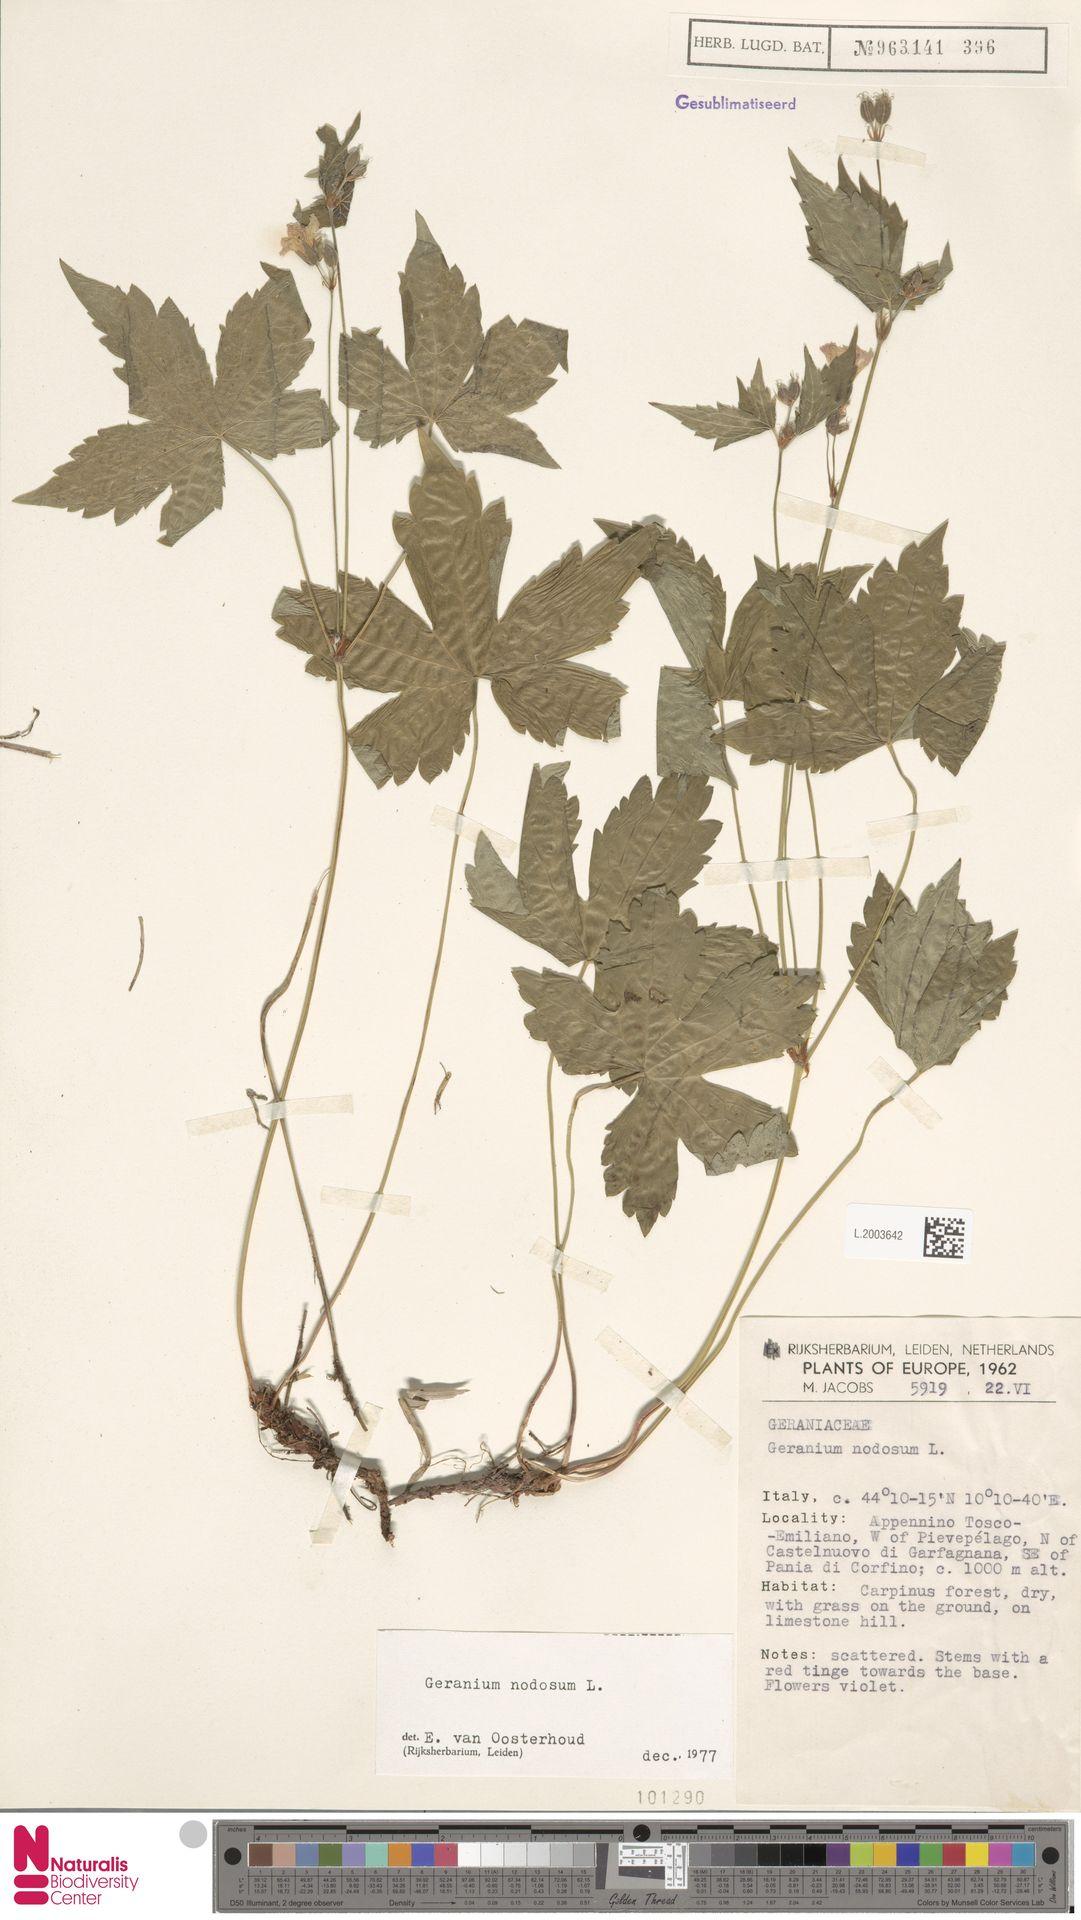 L.2003642   Geranium nodosum L.